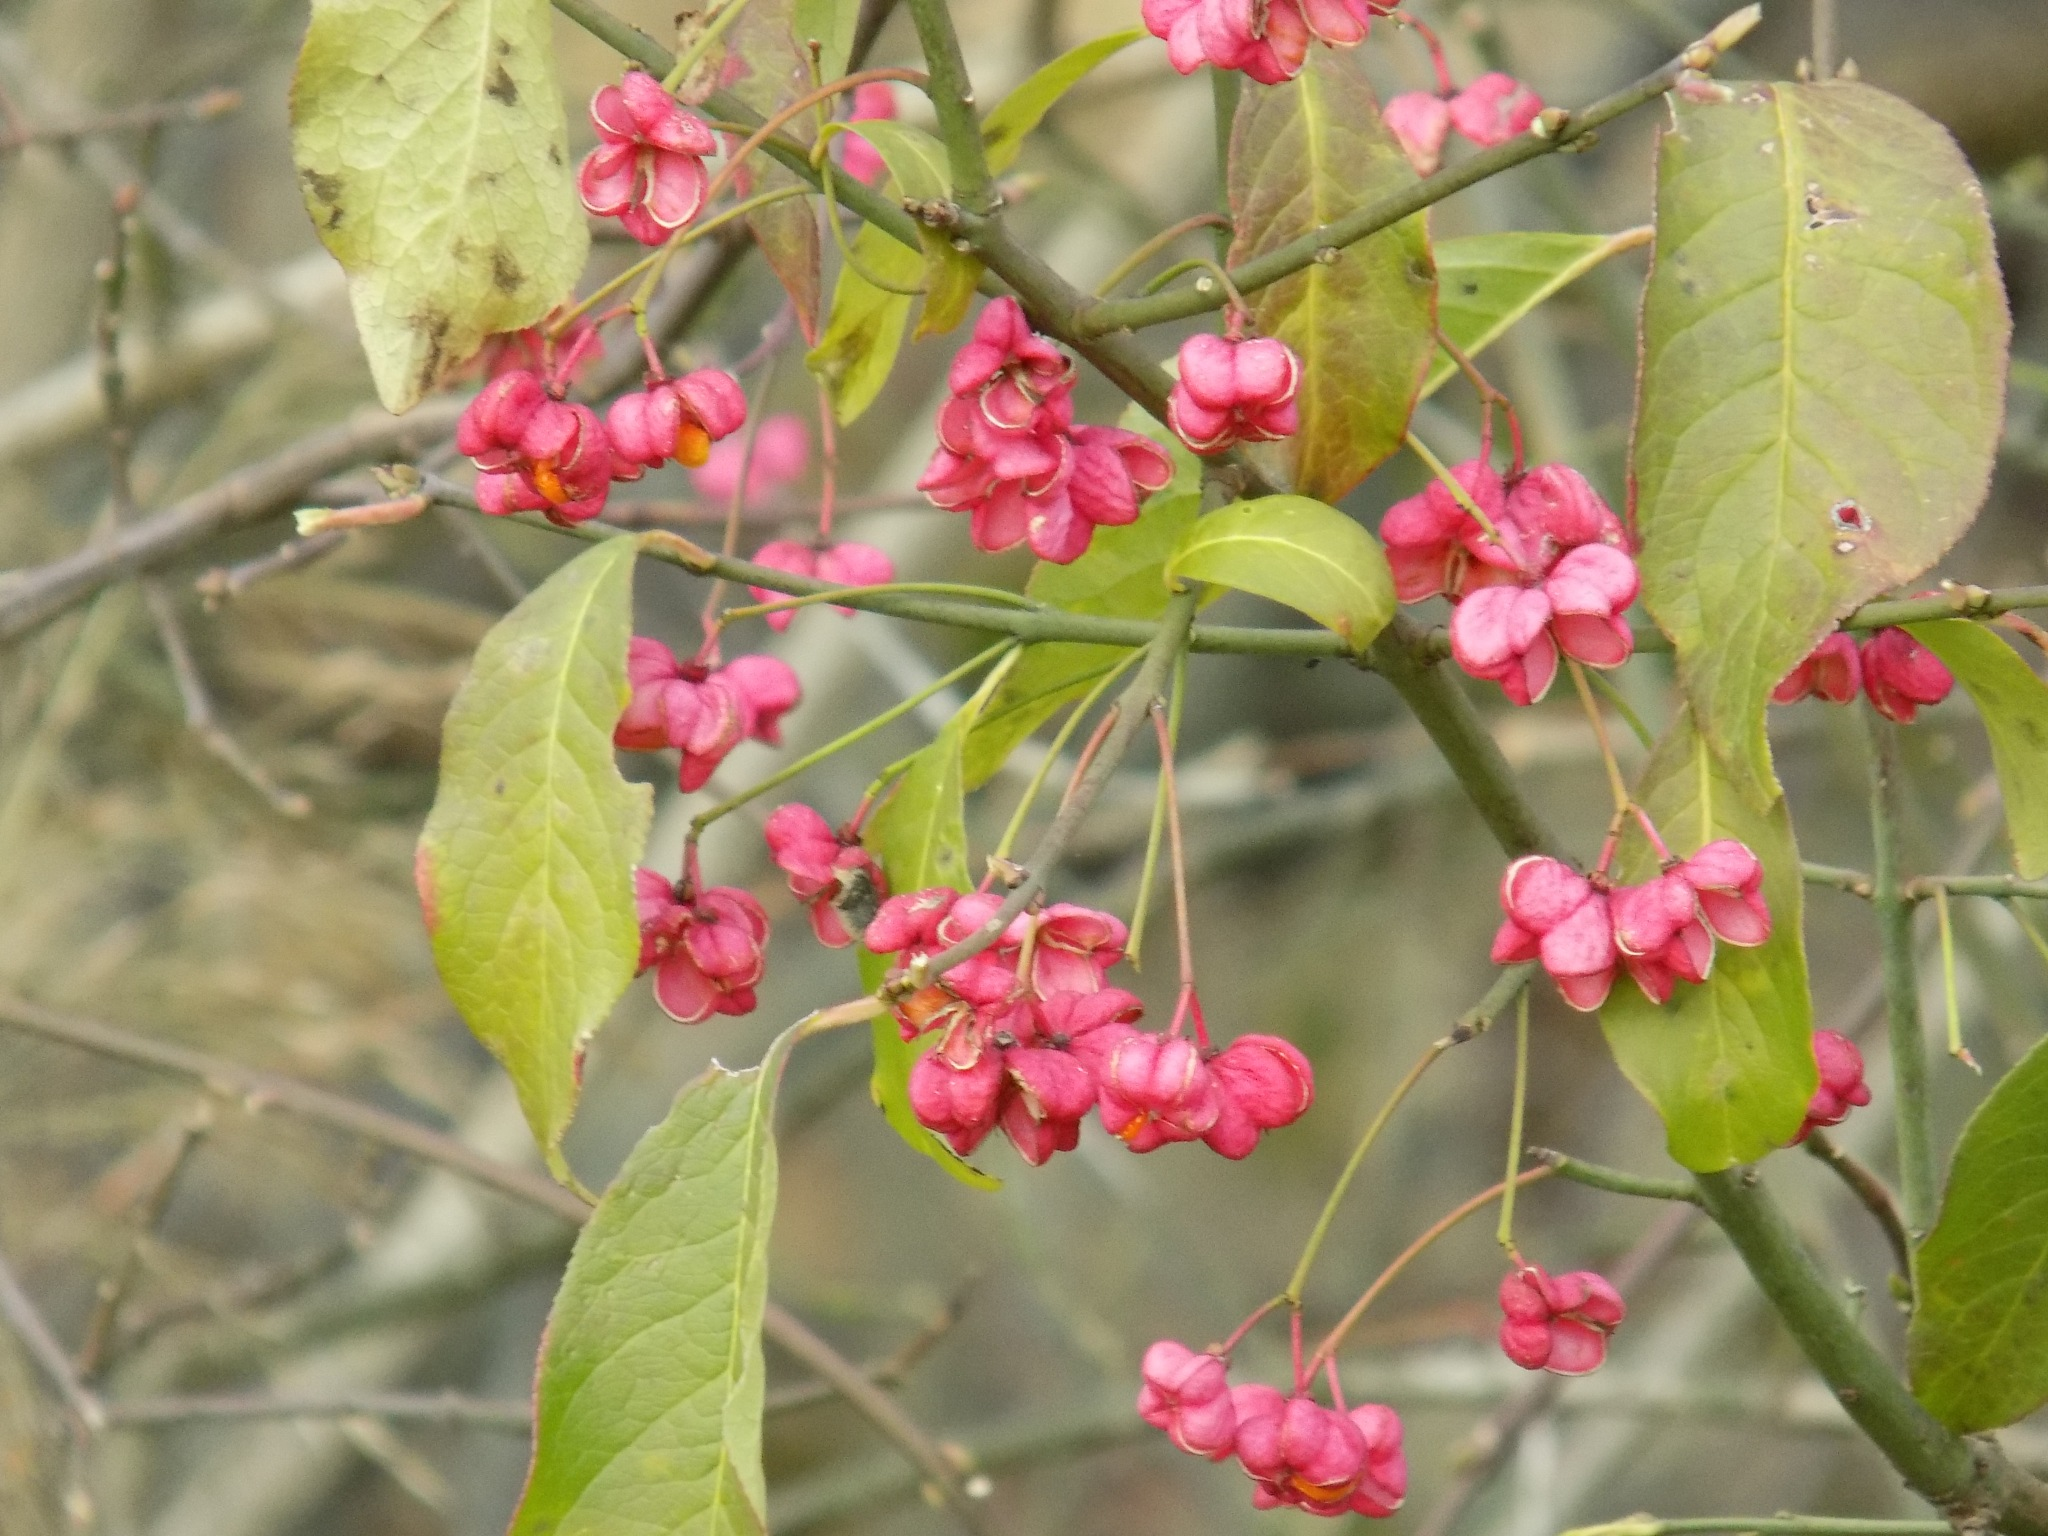 Gooseberry in autumn by uzkuraitiene62